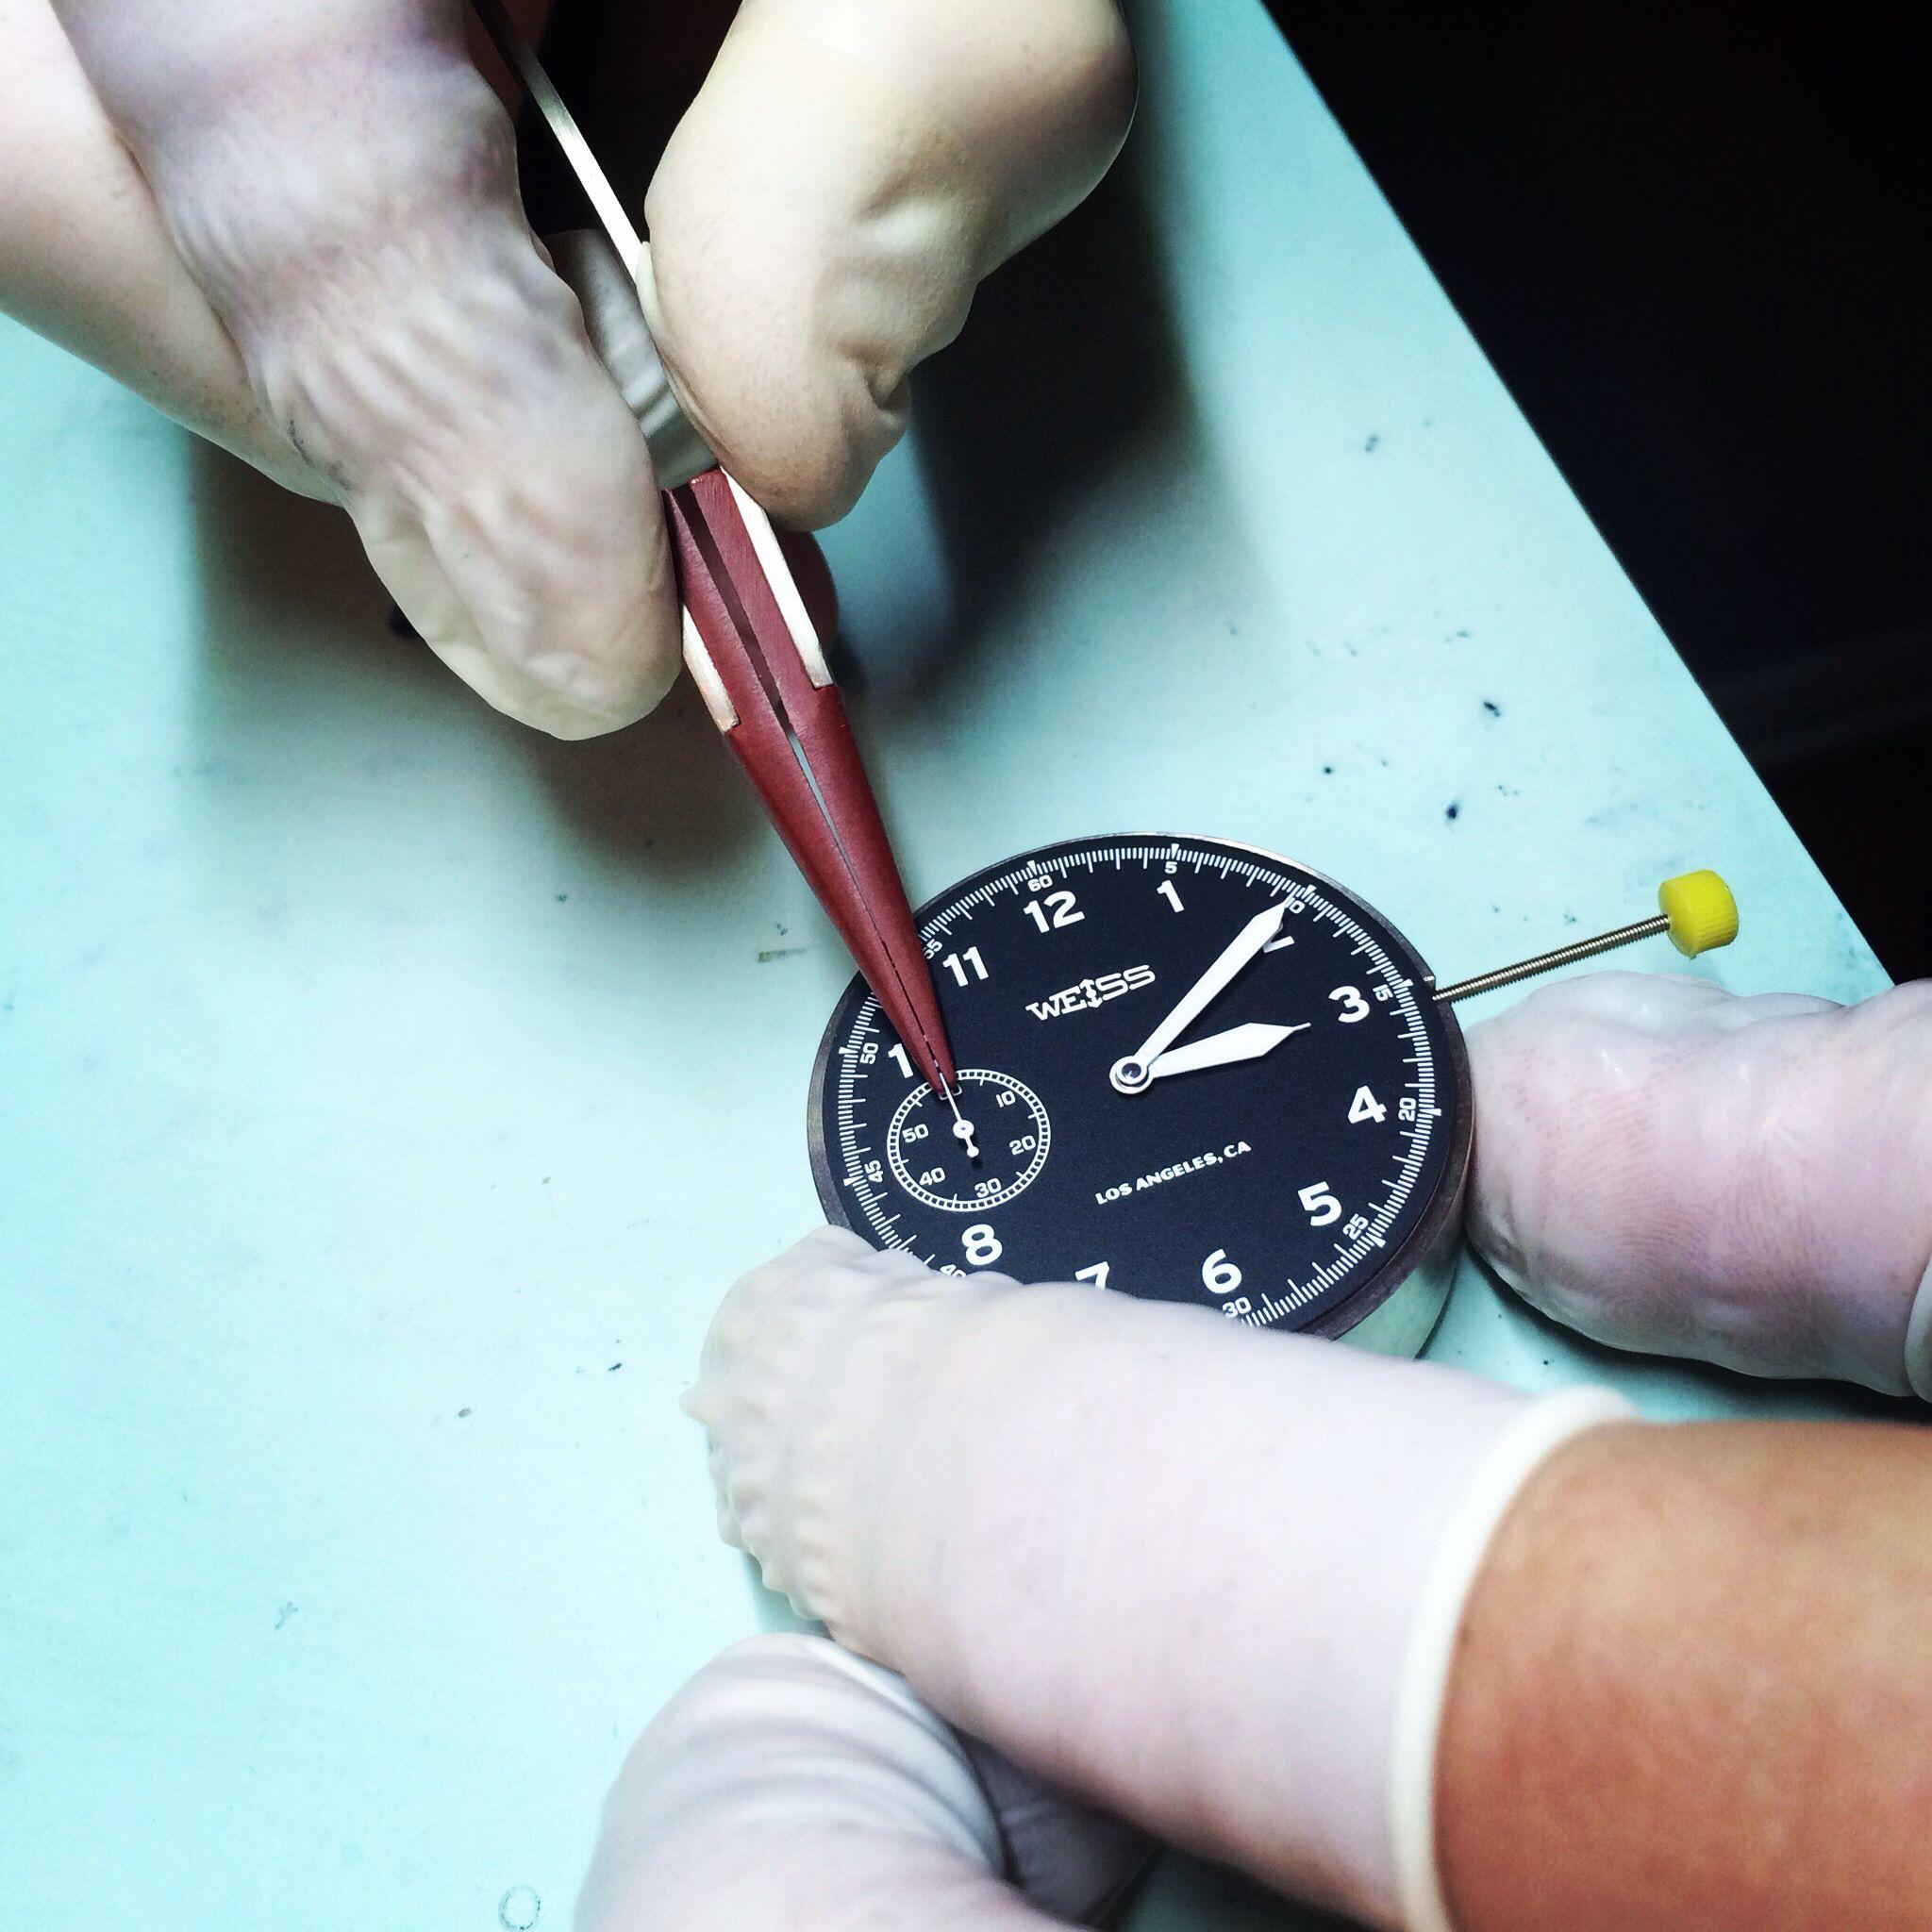 Pin van Gees op watchmaker